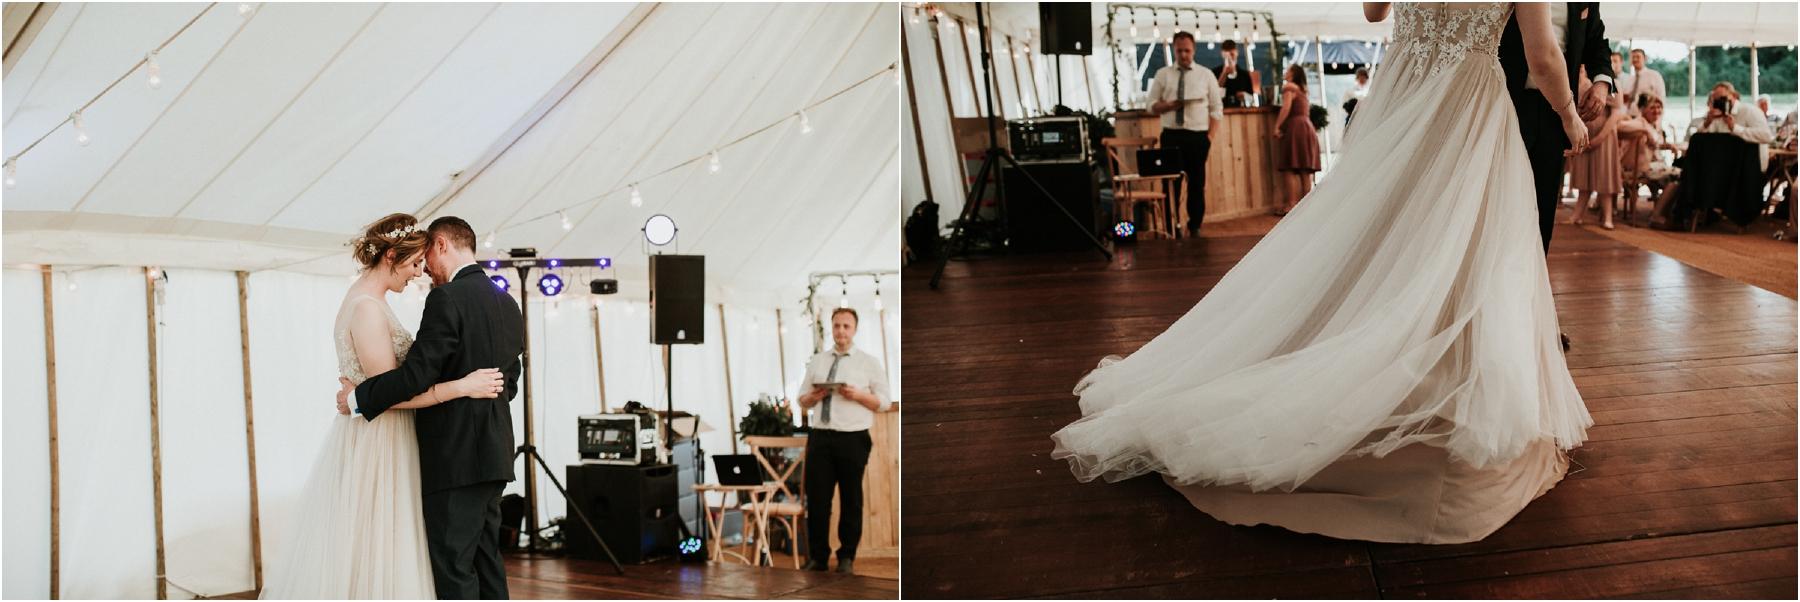 Herefordshire-uk-wedding-photographer_0069.jpg